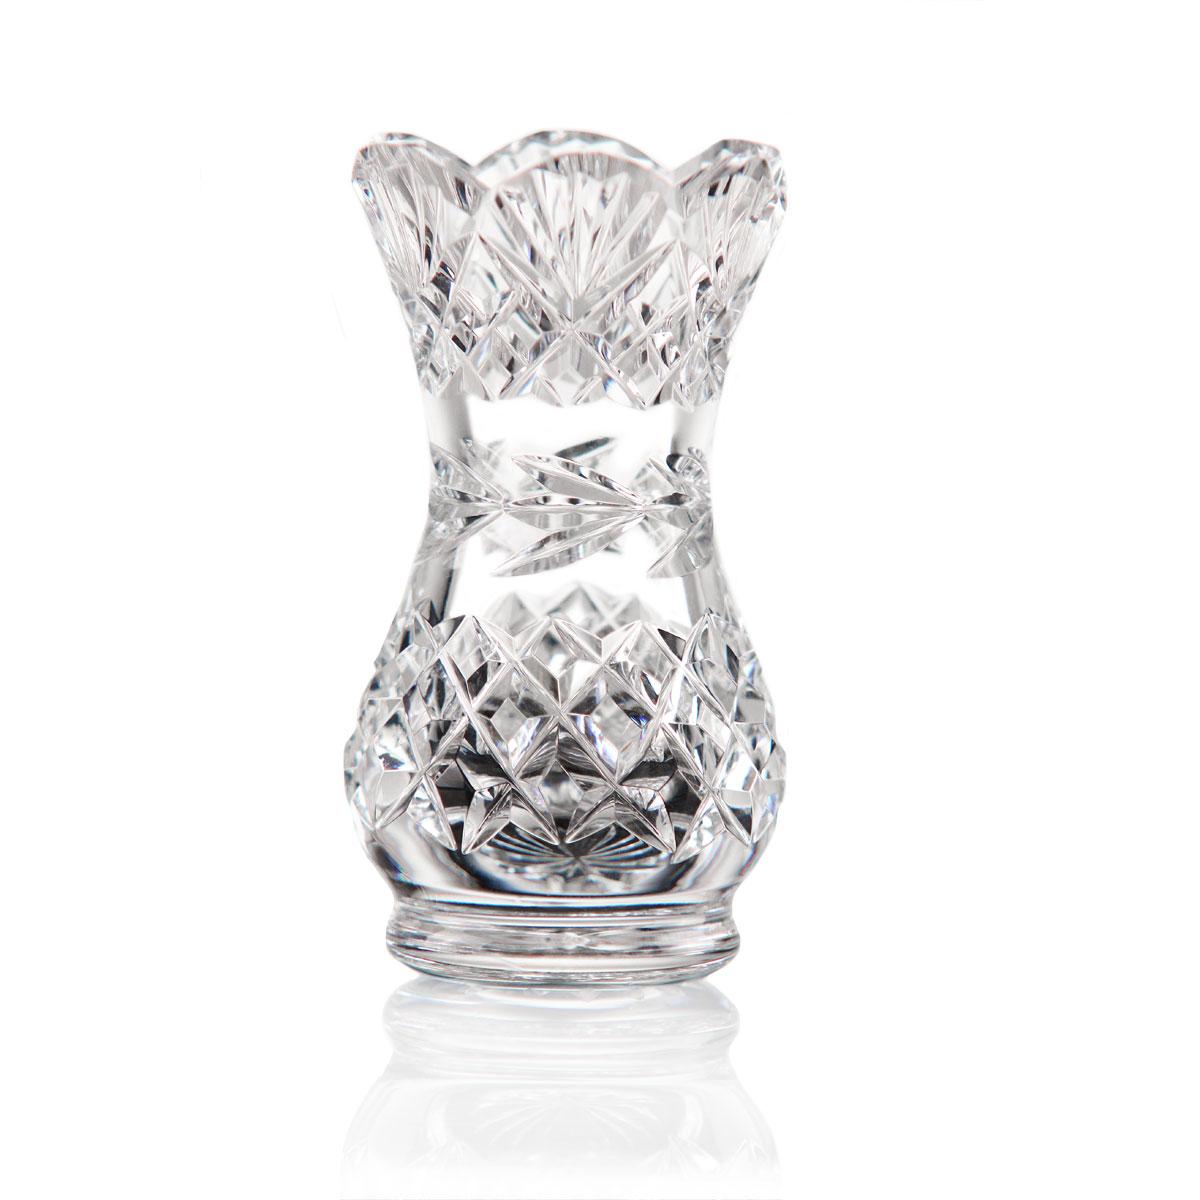 Cashs Ireland, Scalloped Posy Vase